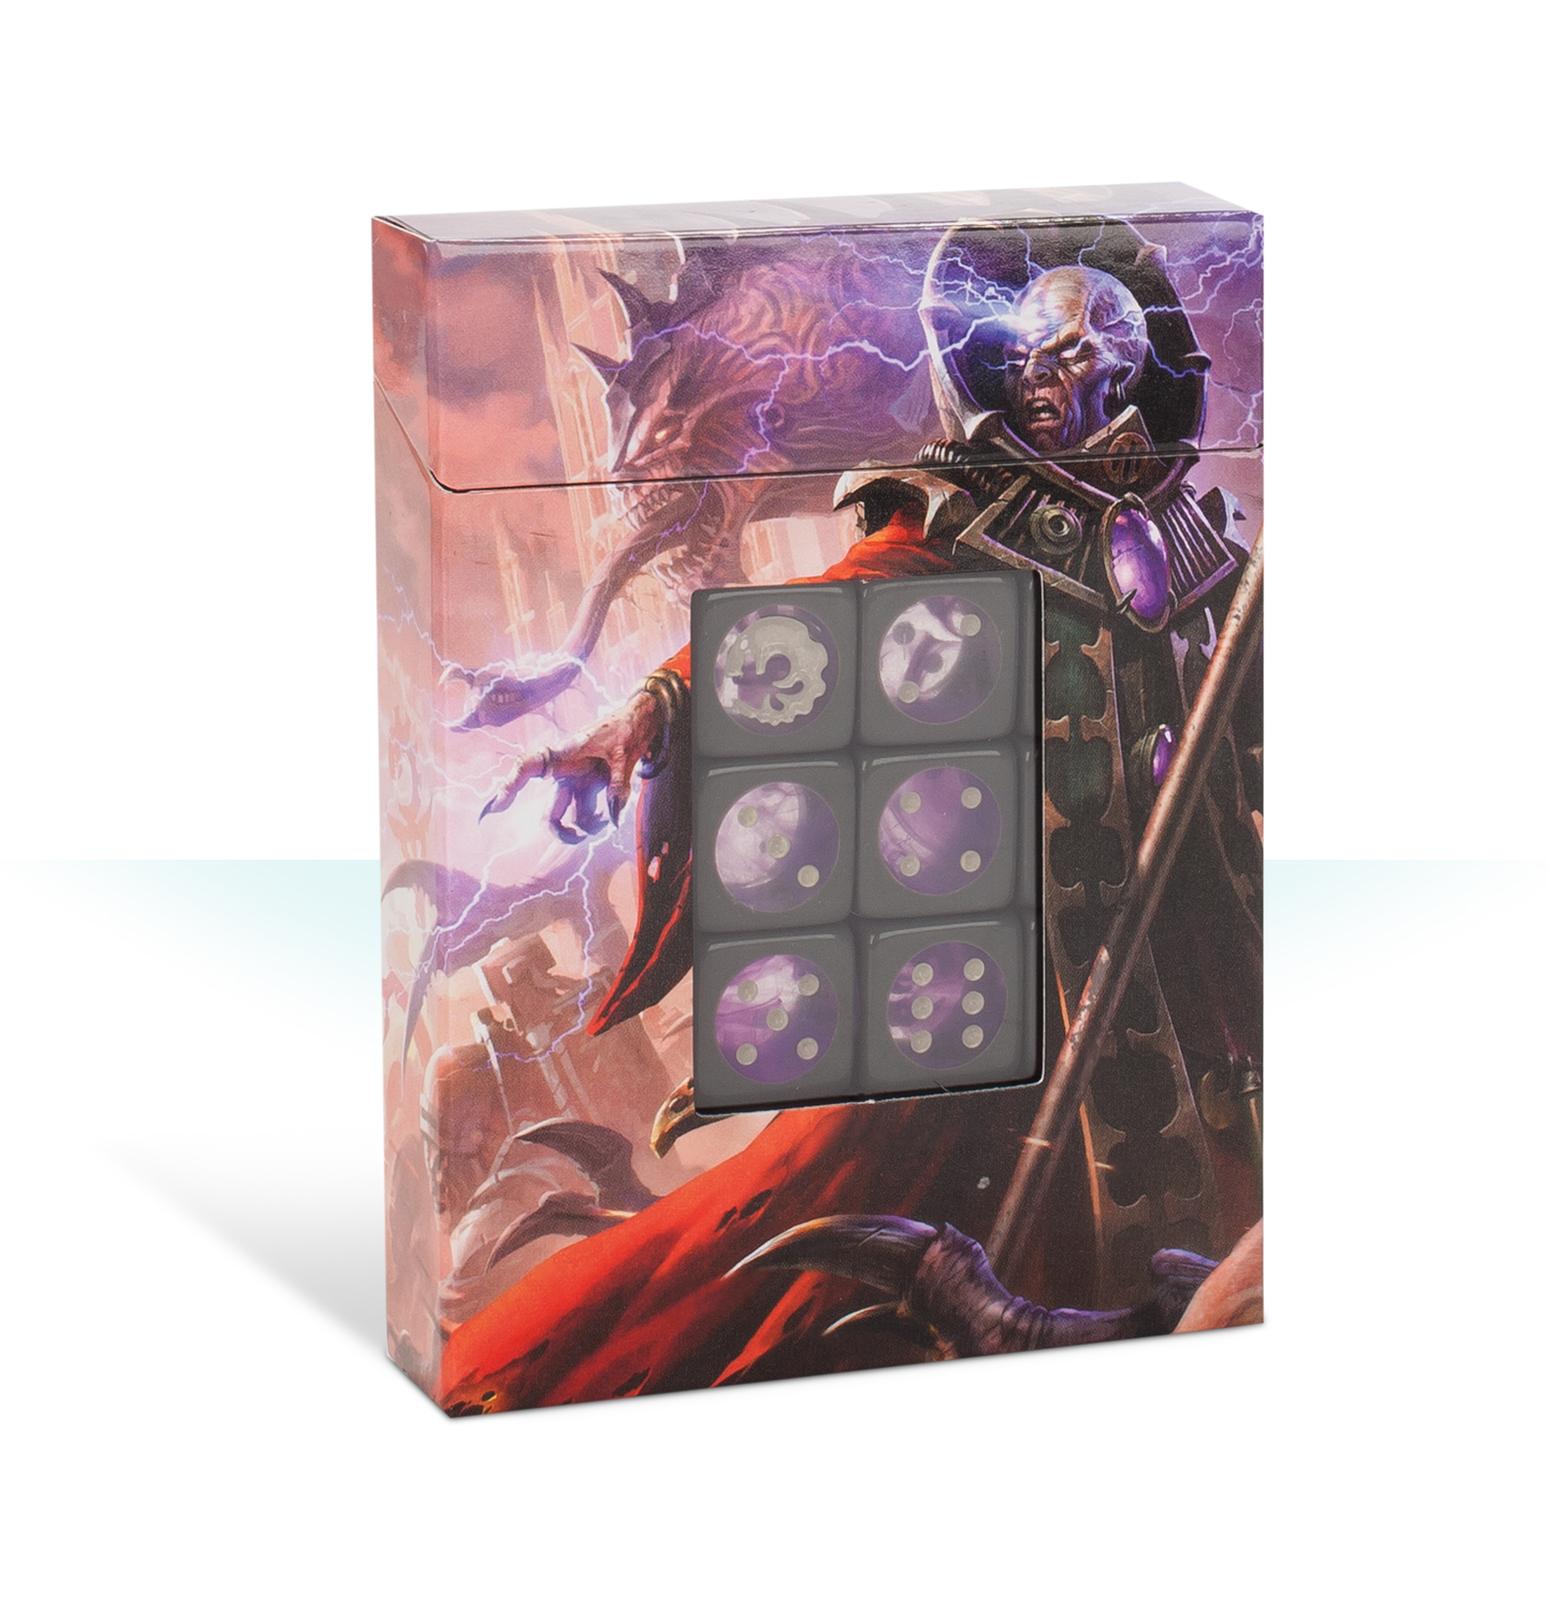 Warhammer 40,000 Genestealer Cults Dice image